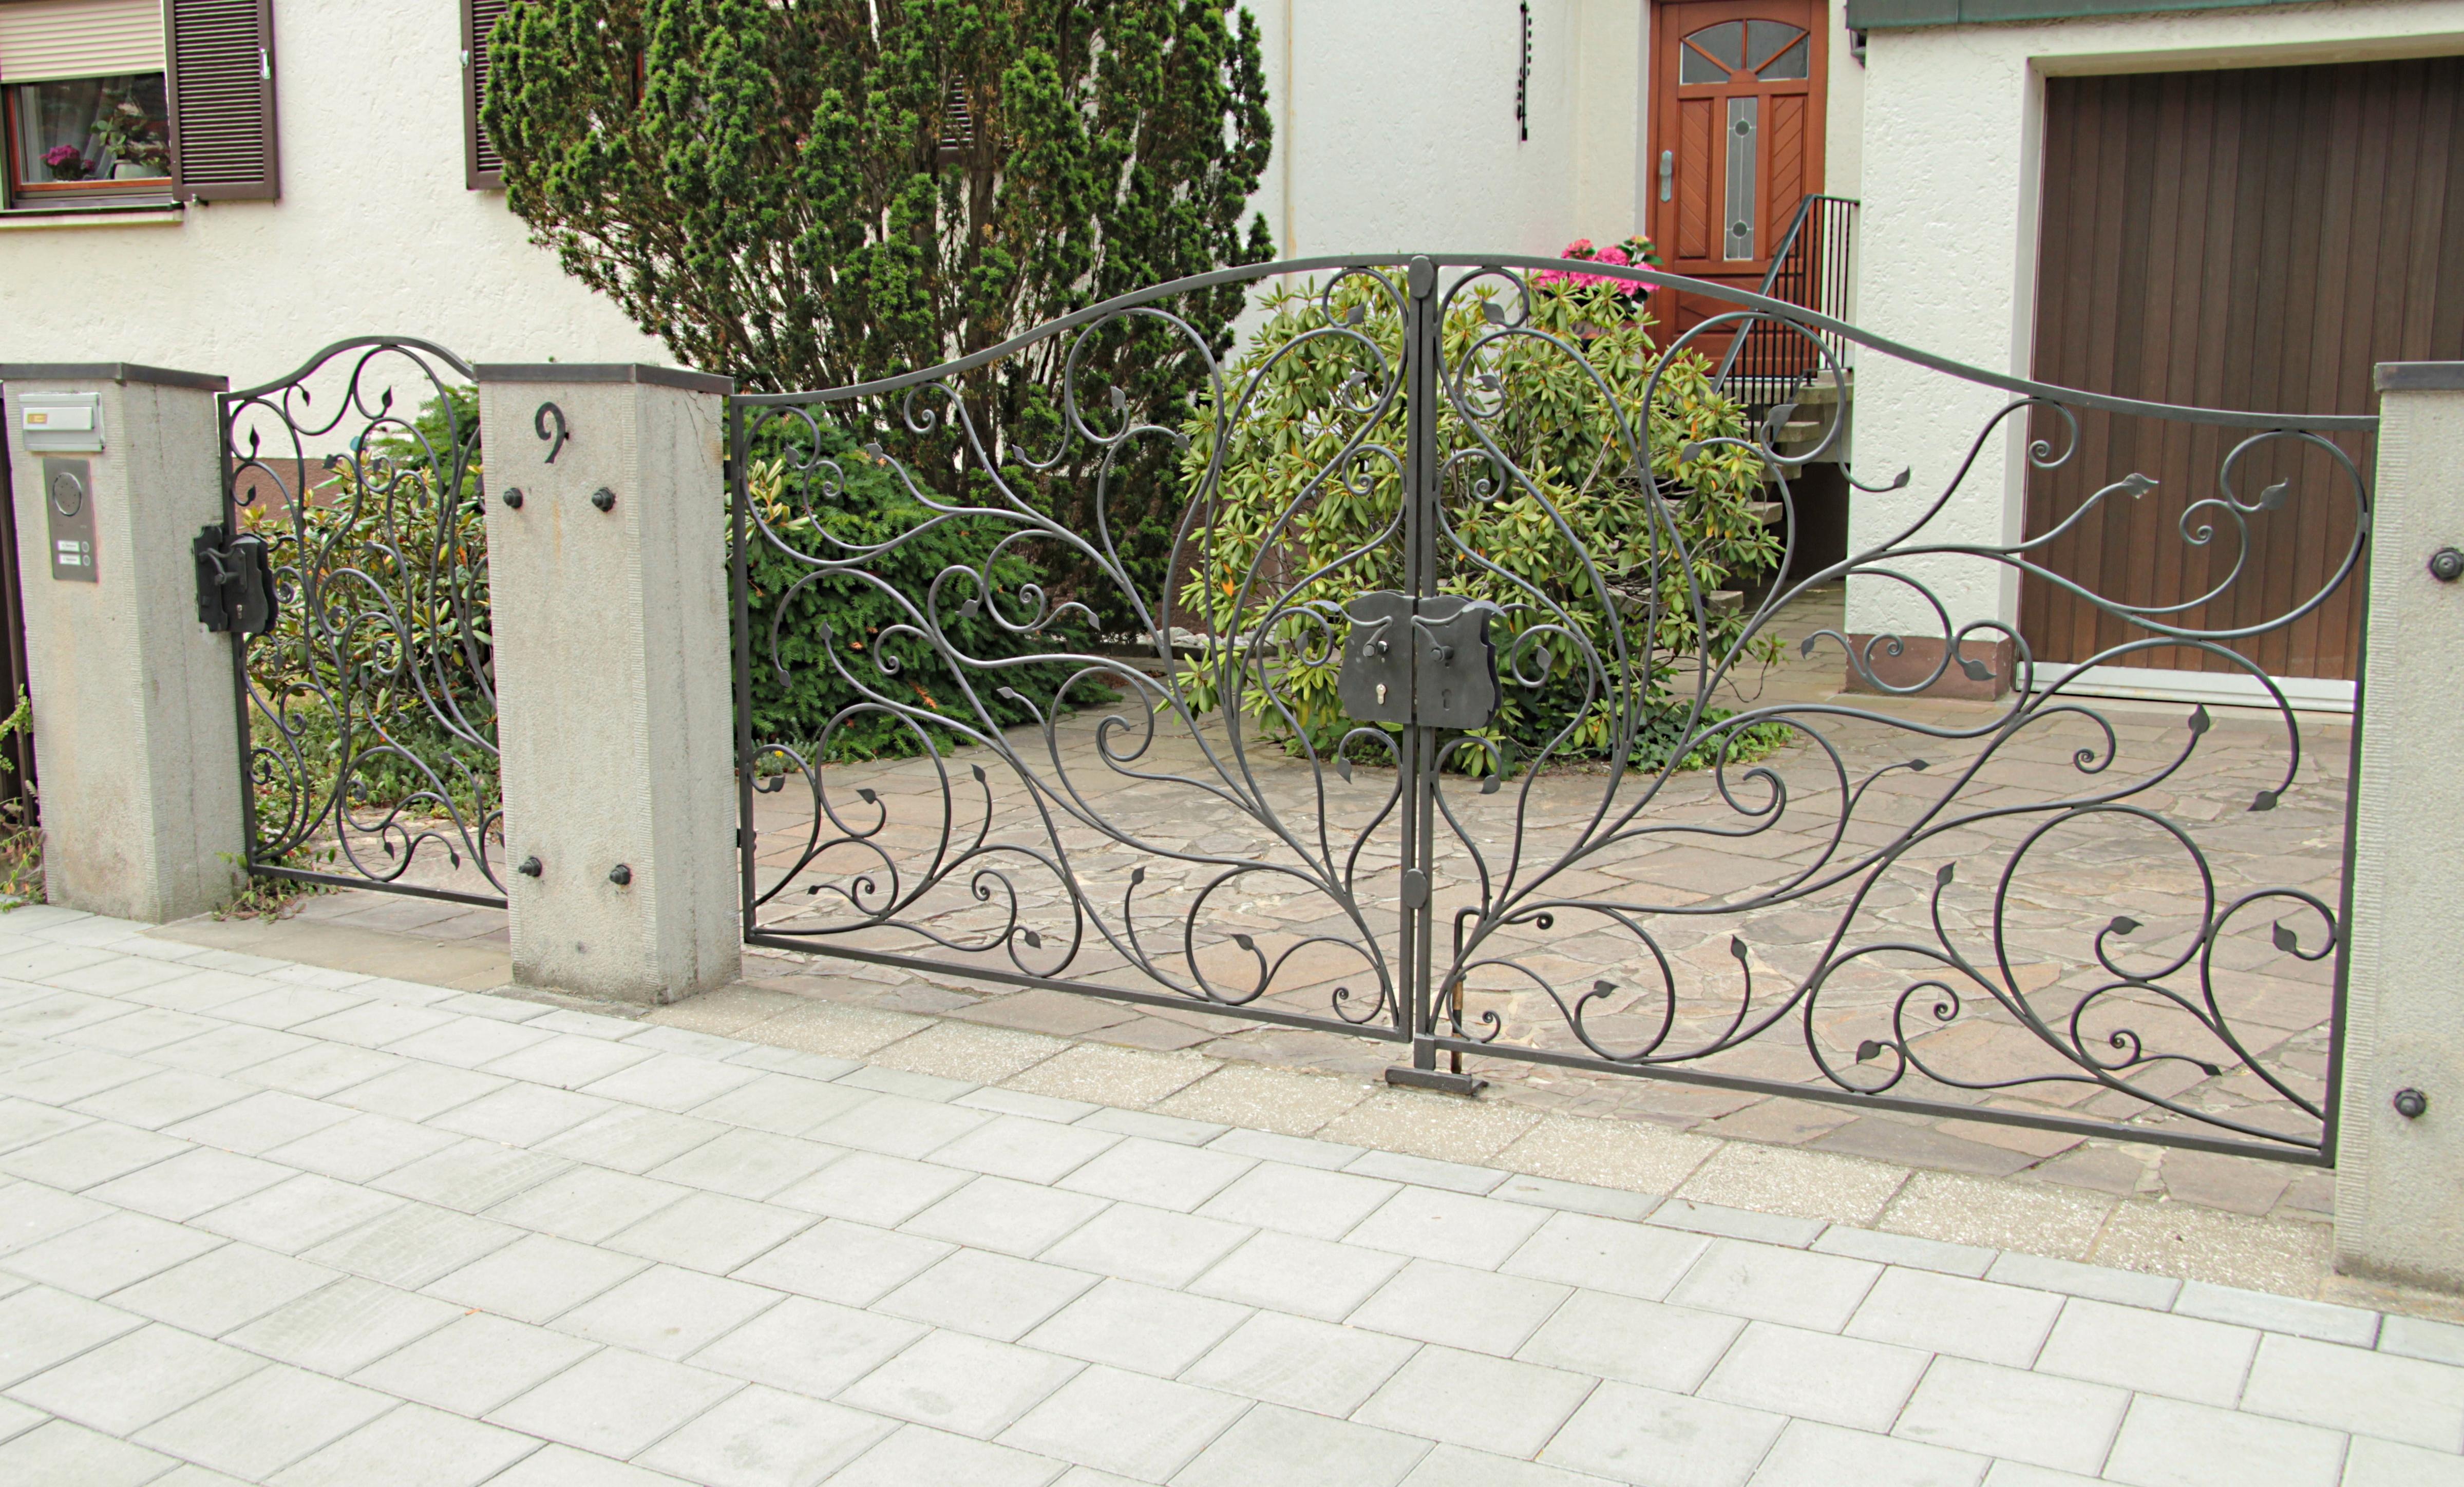 glastr eingangstr best pforte tr eingangstor gartentor hoftor grau beschichtet cm xcm sandbach. Black Bedroom Furniture Sets. Home Design Ideas